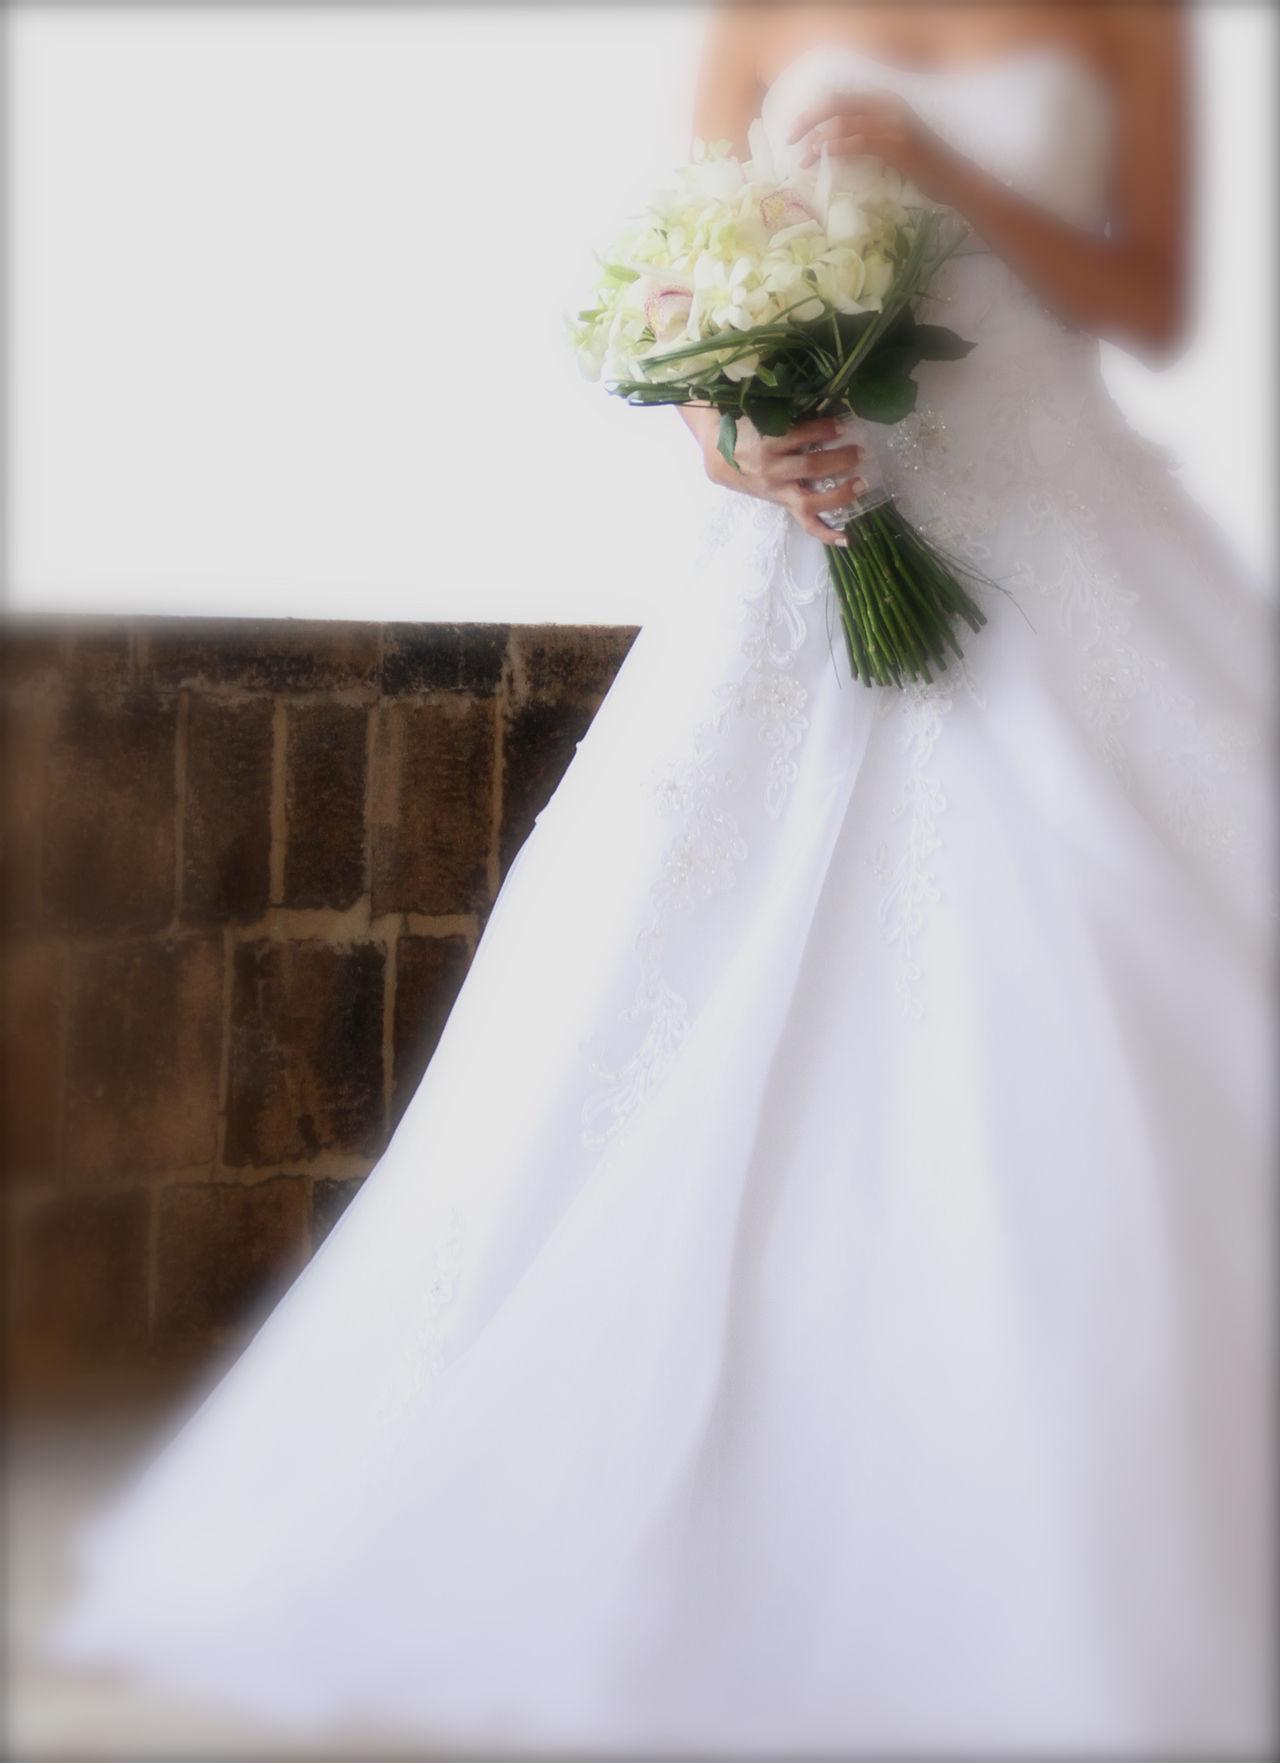 Bride Bride Dress Dream Catcher Flowers Weddind Wedding Day Wedding Dress Wedding Photography